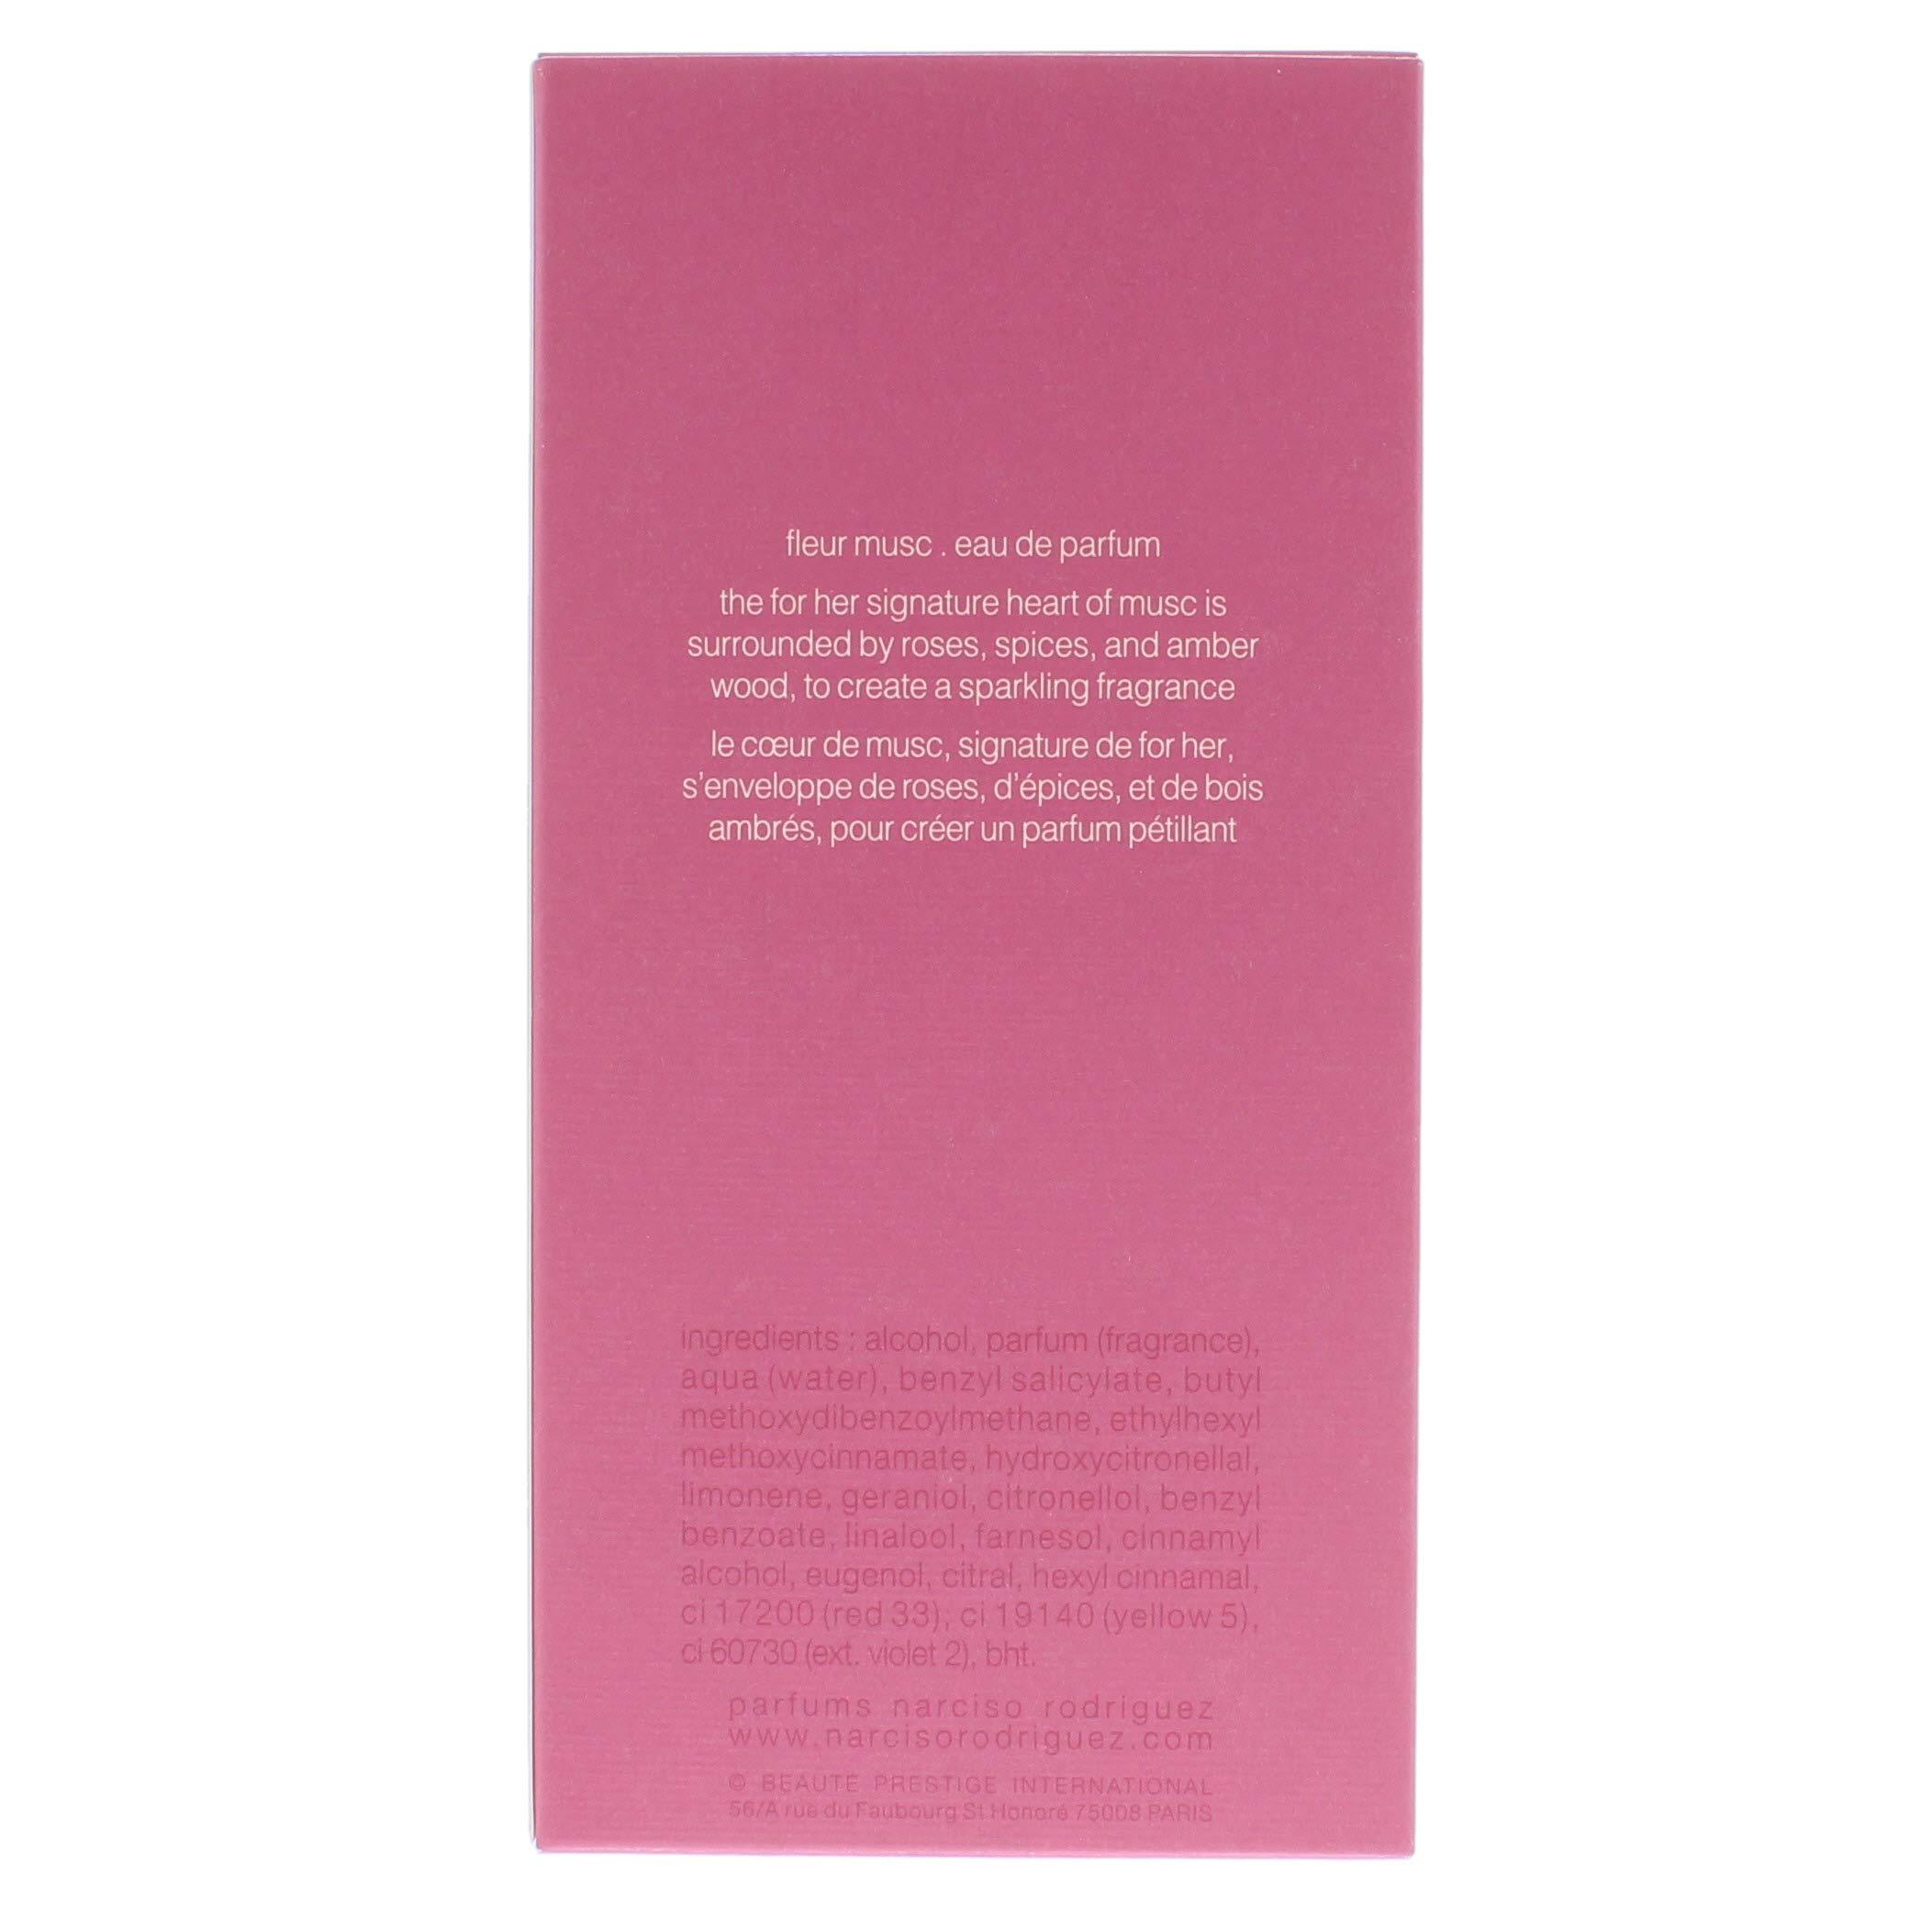 Narciso Rodriguez Fleur Musc for Her 3.3 Ounce Eau De Parfum Spray, 3.3 Ounce